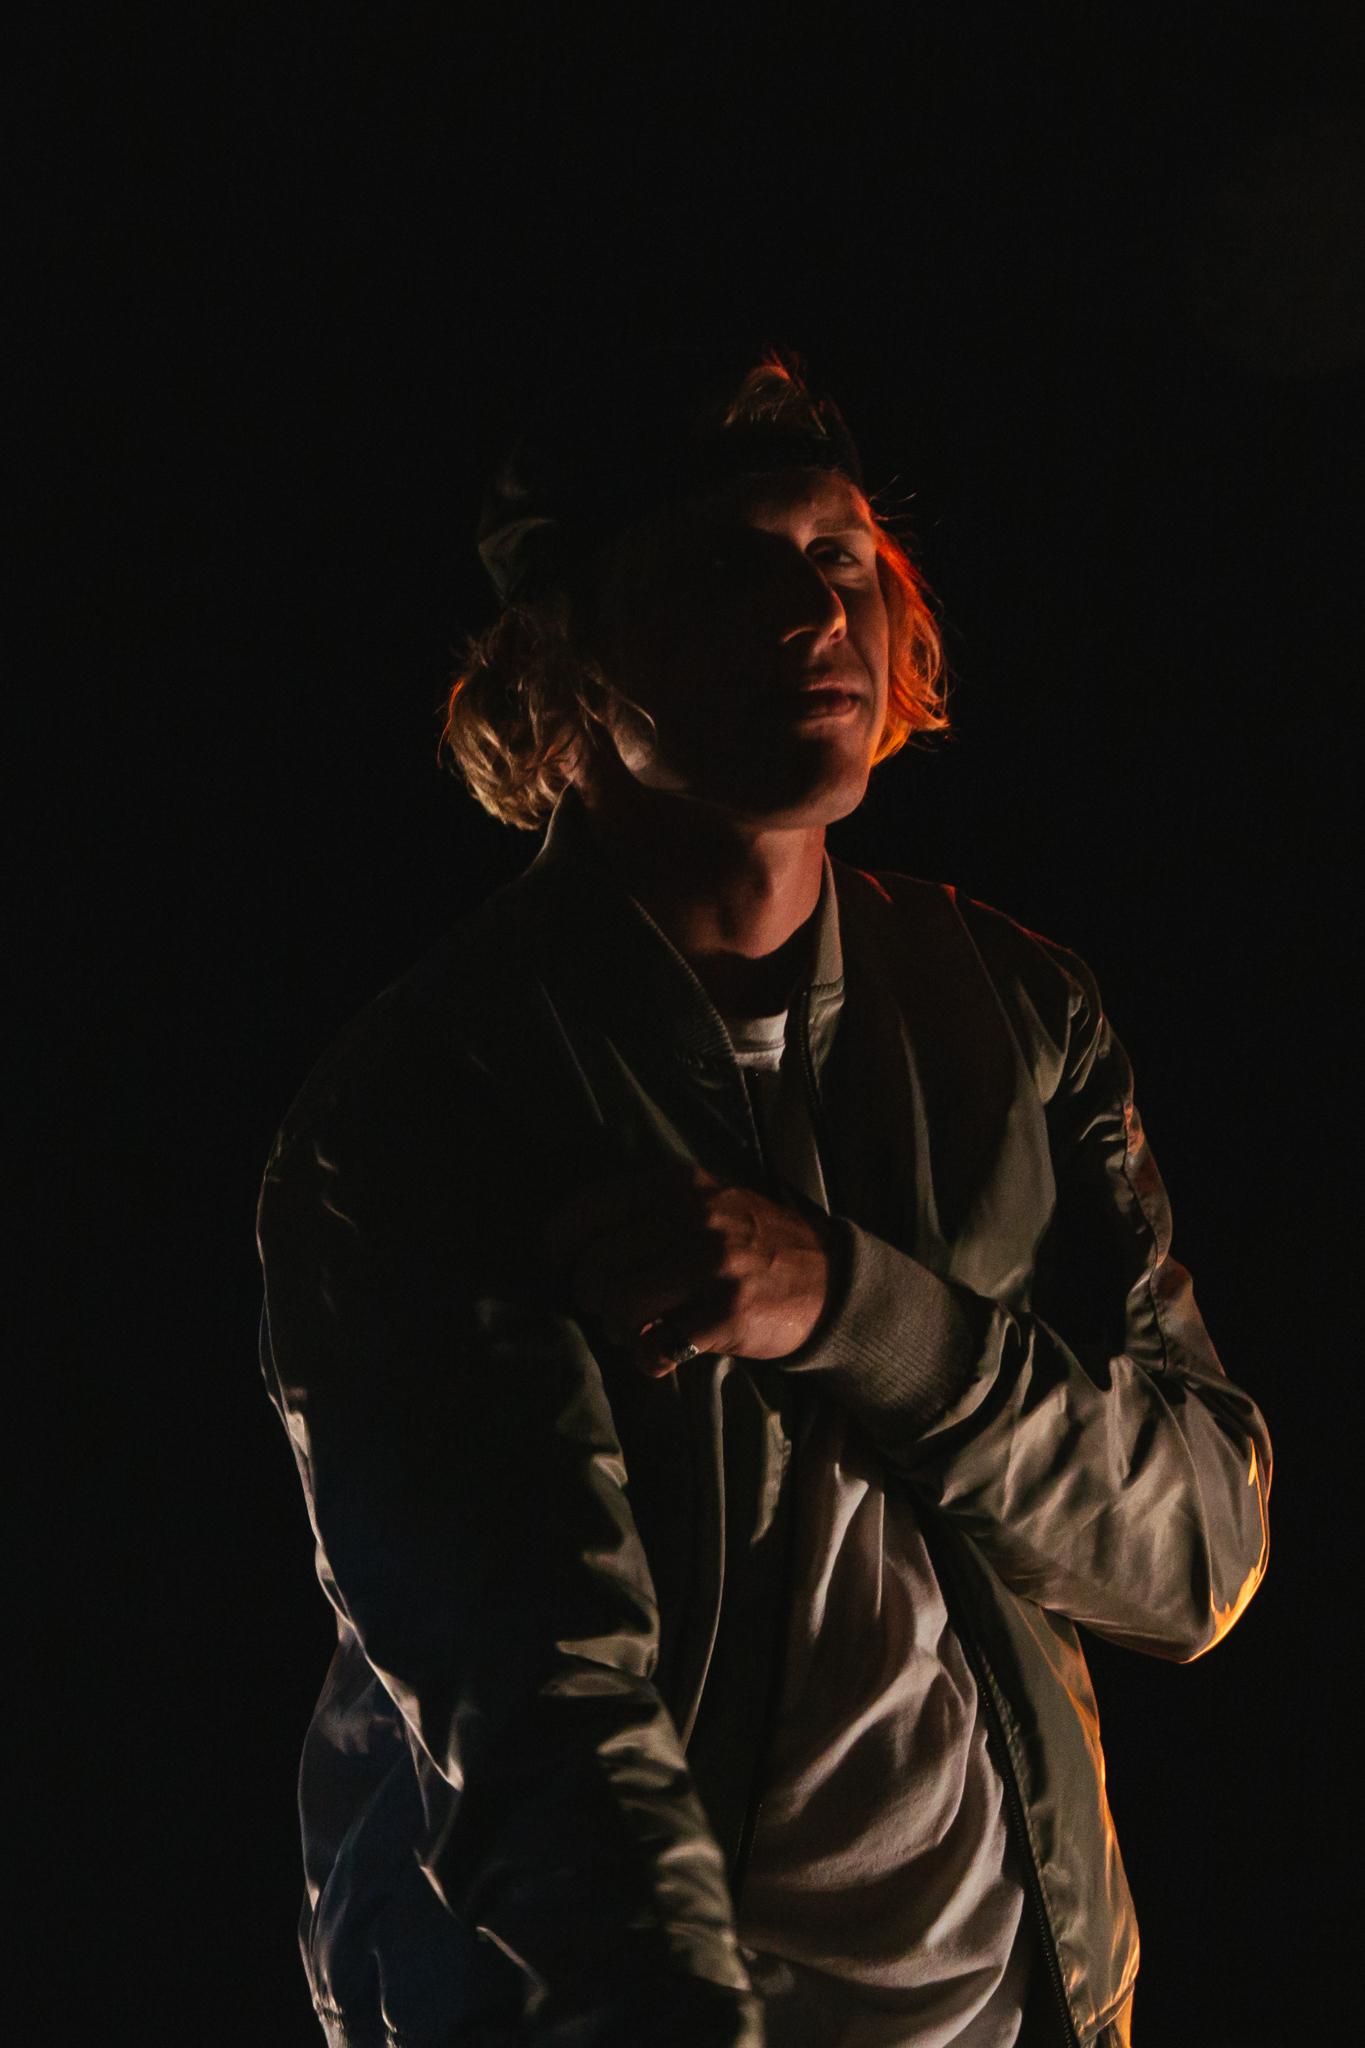 Mitch Lowe Photo -  Mountain Sounds Festival-112.jpg